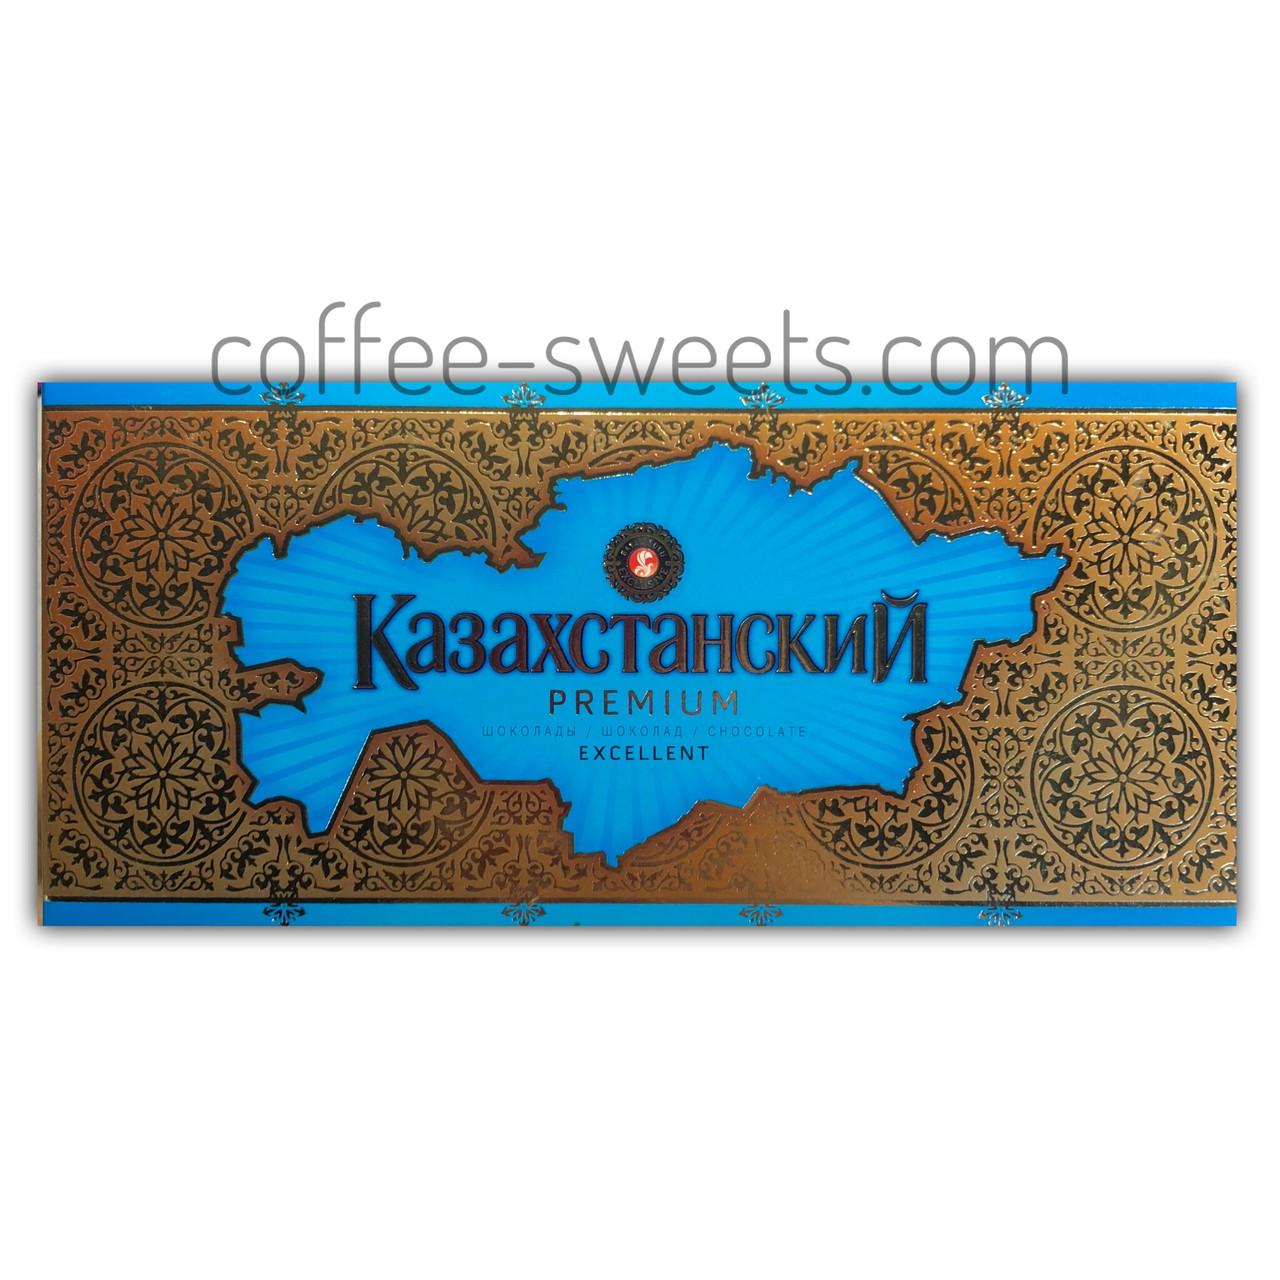 Шоколад Казахстанский Premium Excellent 100 гр